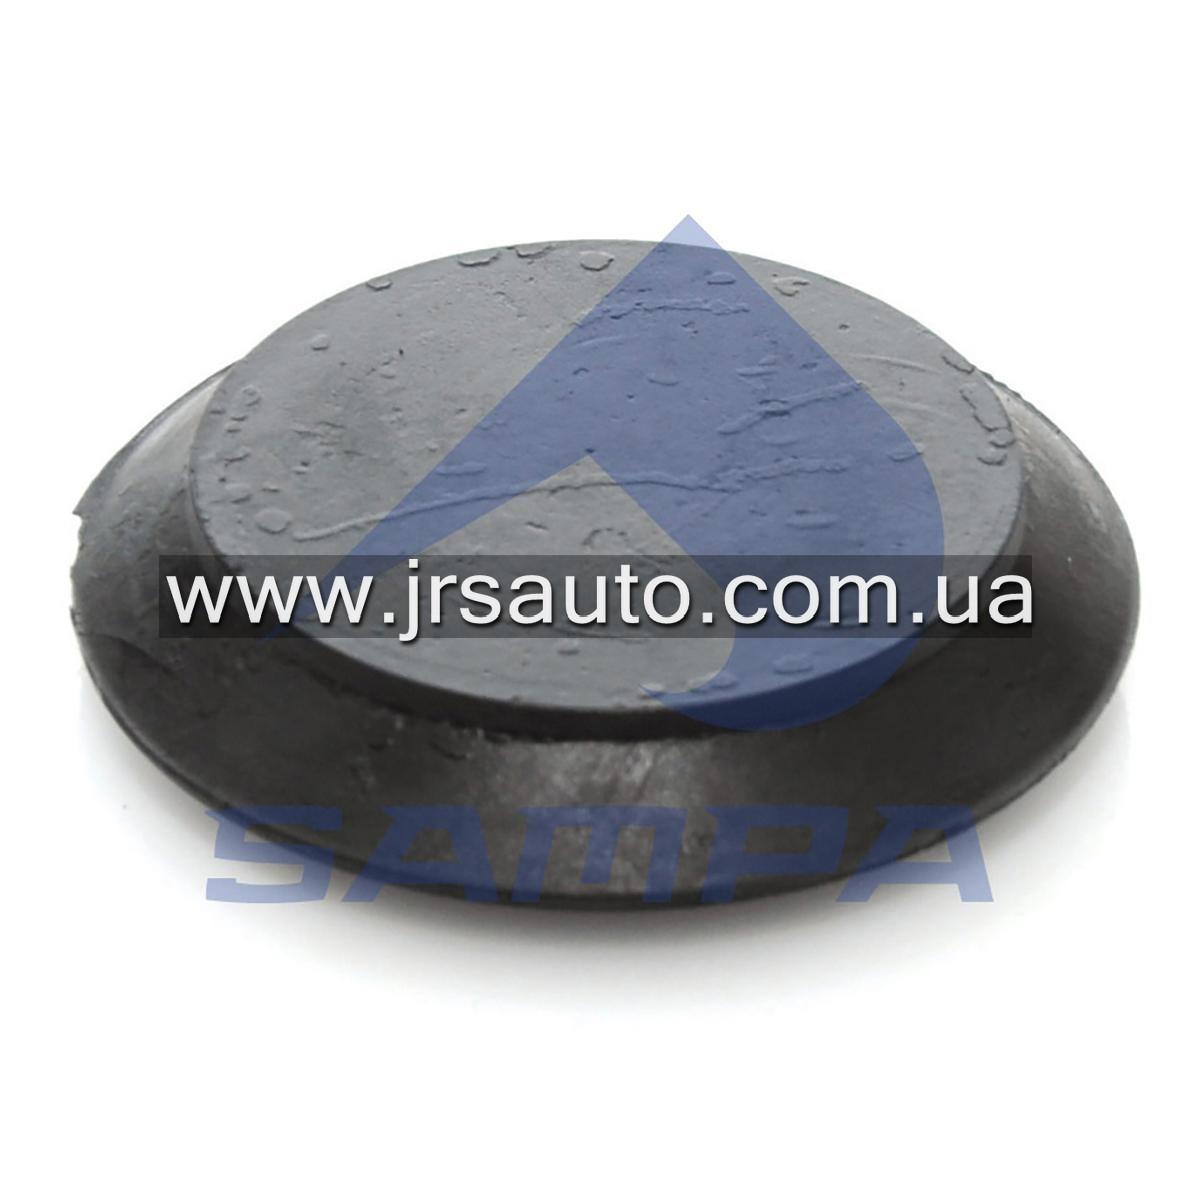 Втулка 74,5x17 стабилизатора DAF XF95 \0361477 \ 050.072